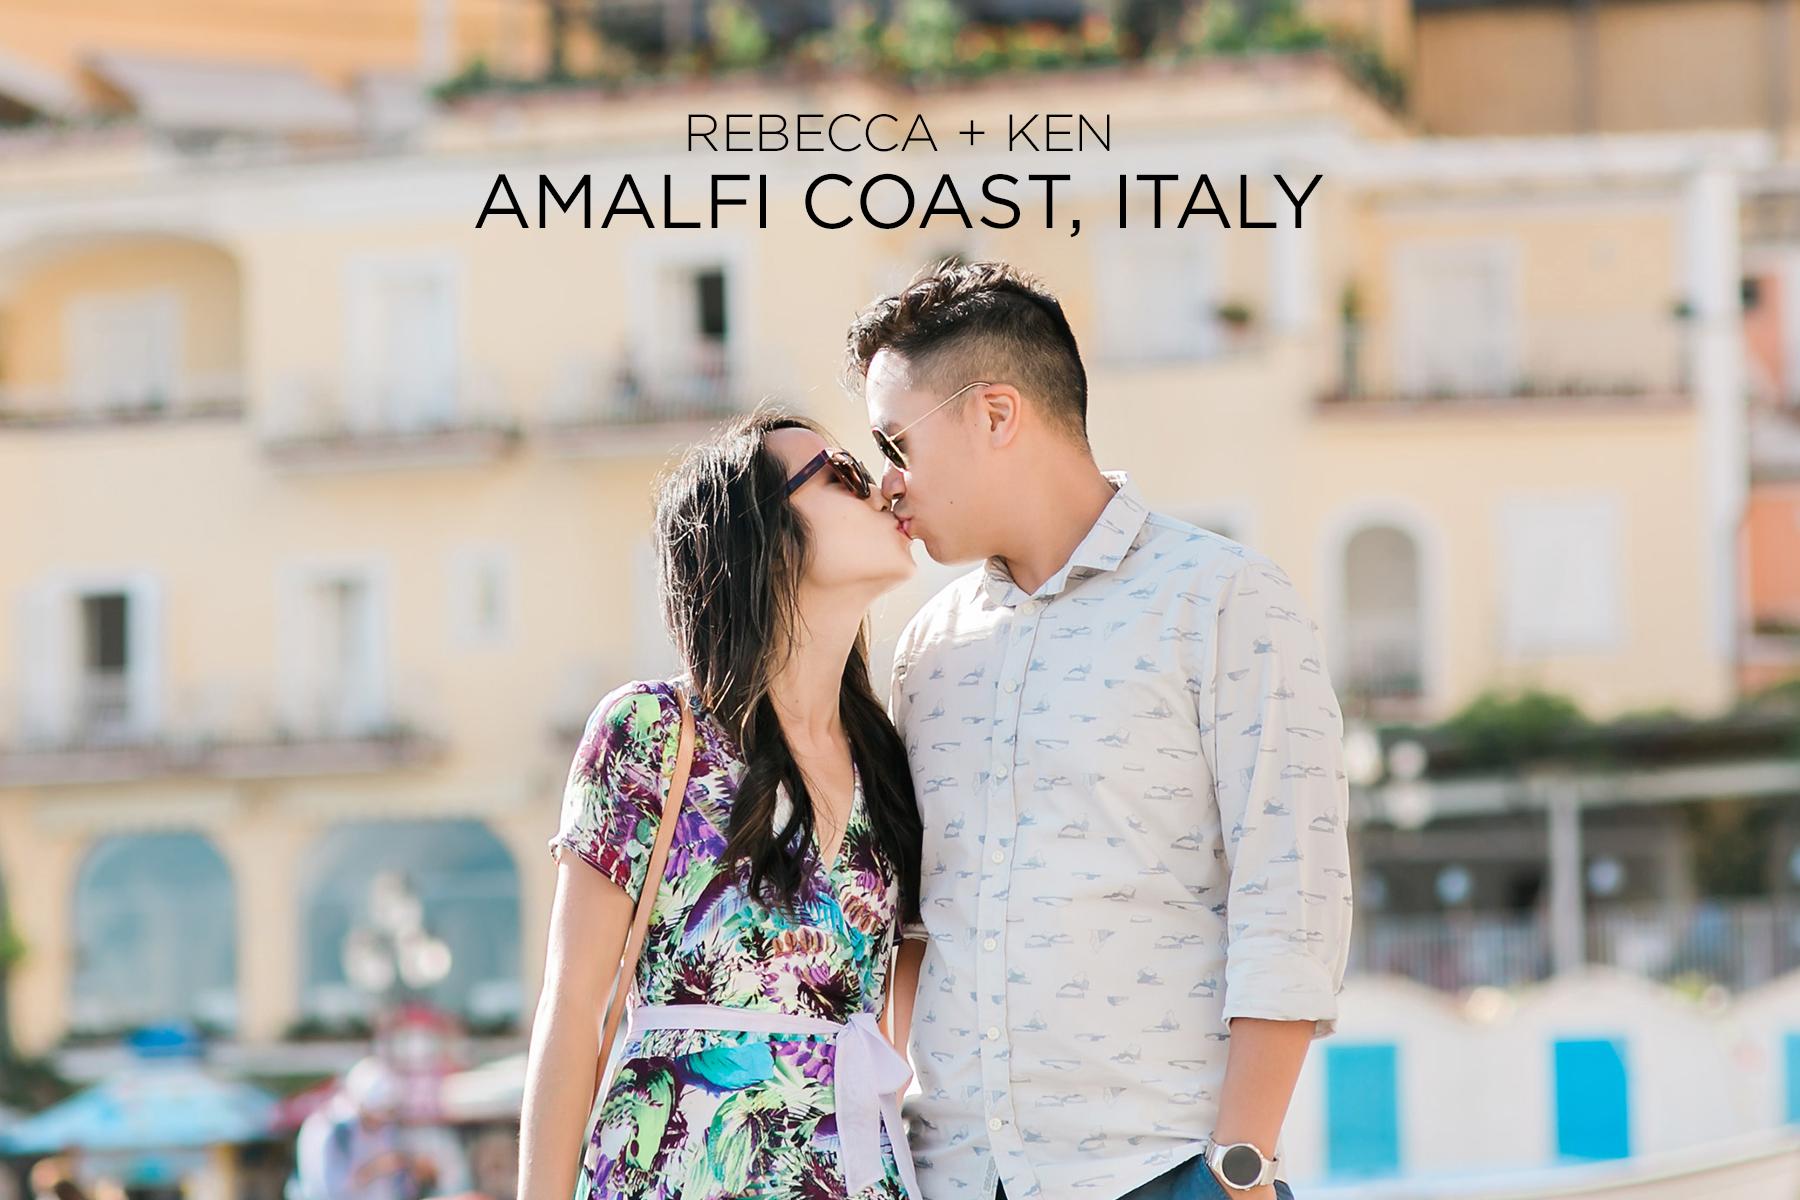 Rebecca and Ken